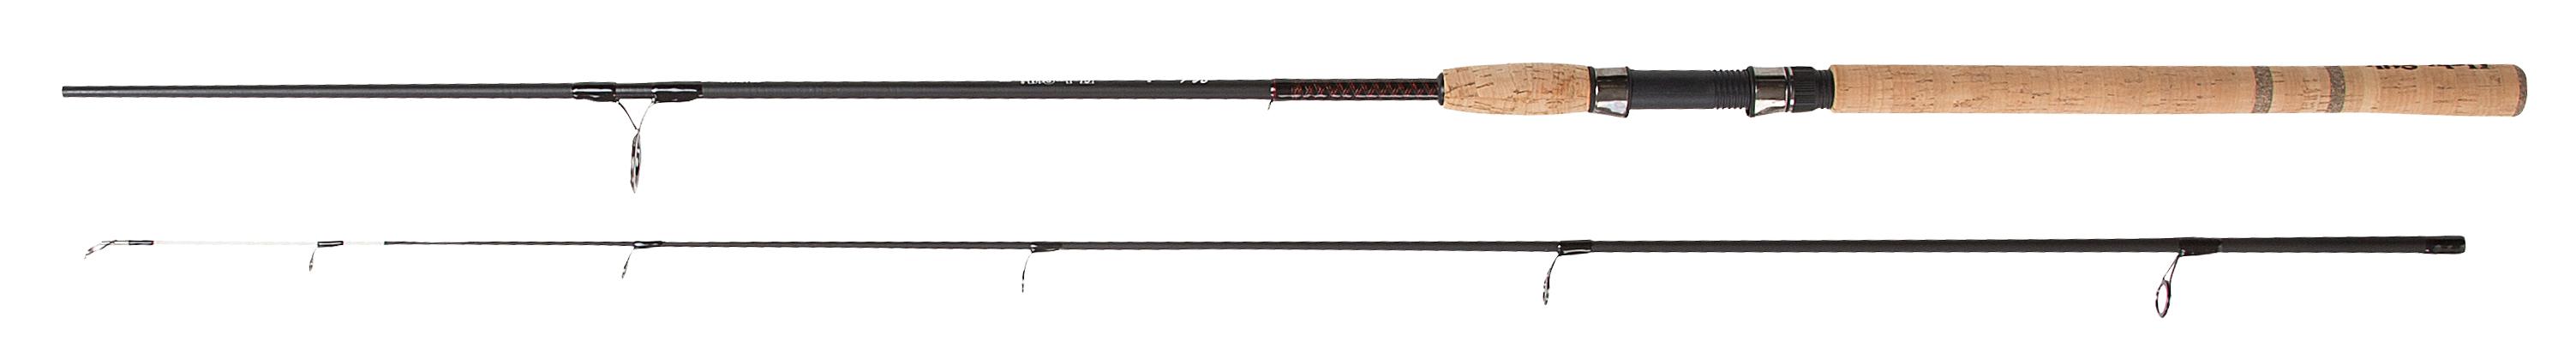 Shakespeare ugly stik elite spinning rod for Ugly stik fishing rod